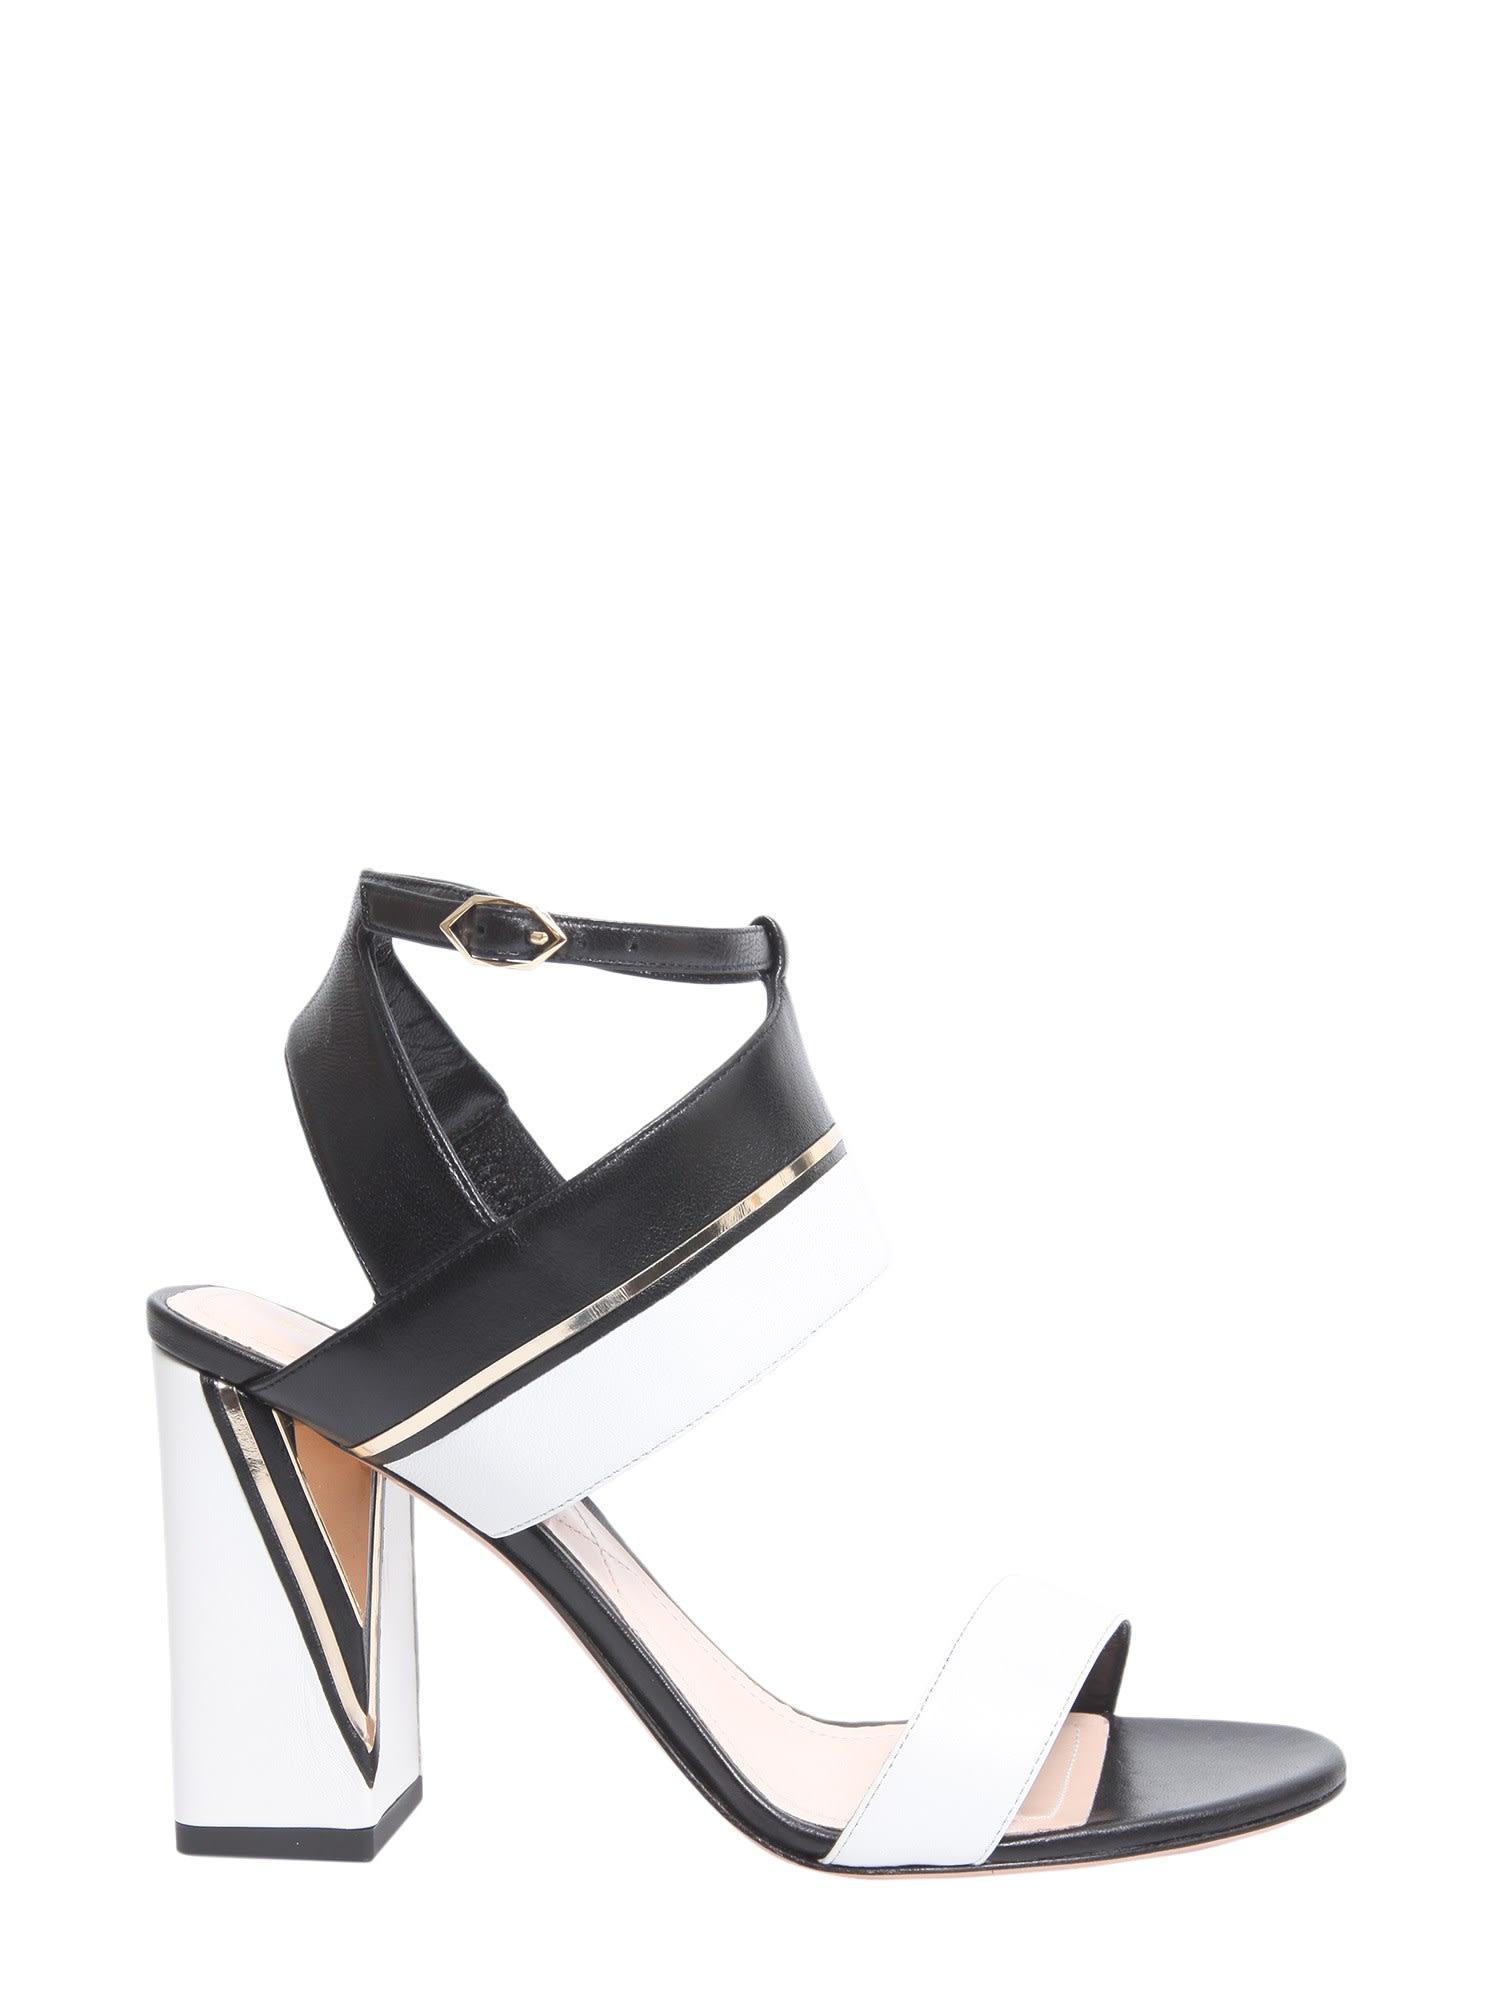 Buy Nicholas Kirkwood Eva Sandals online, shop Nicholas Kirkwood shoes with free shipping